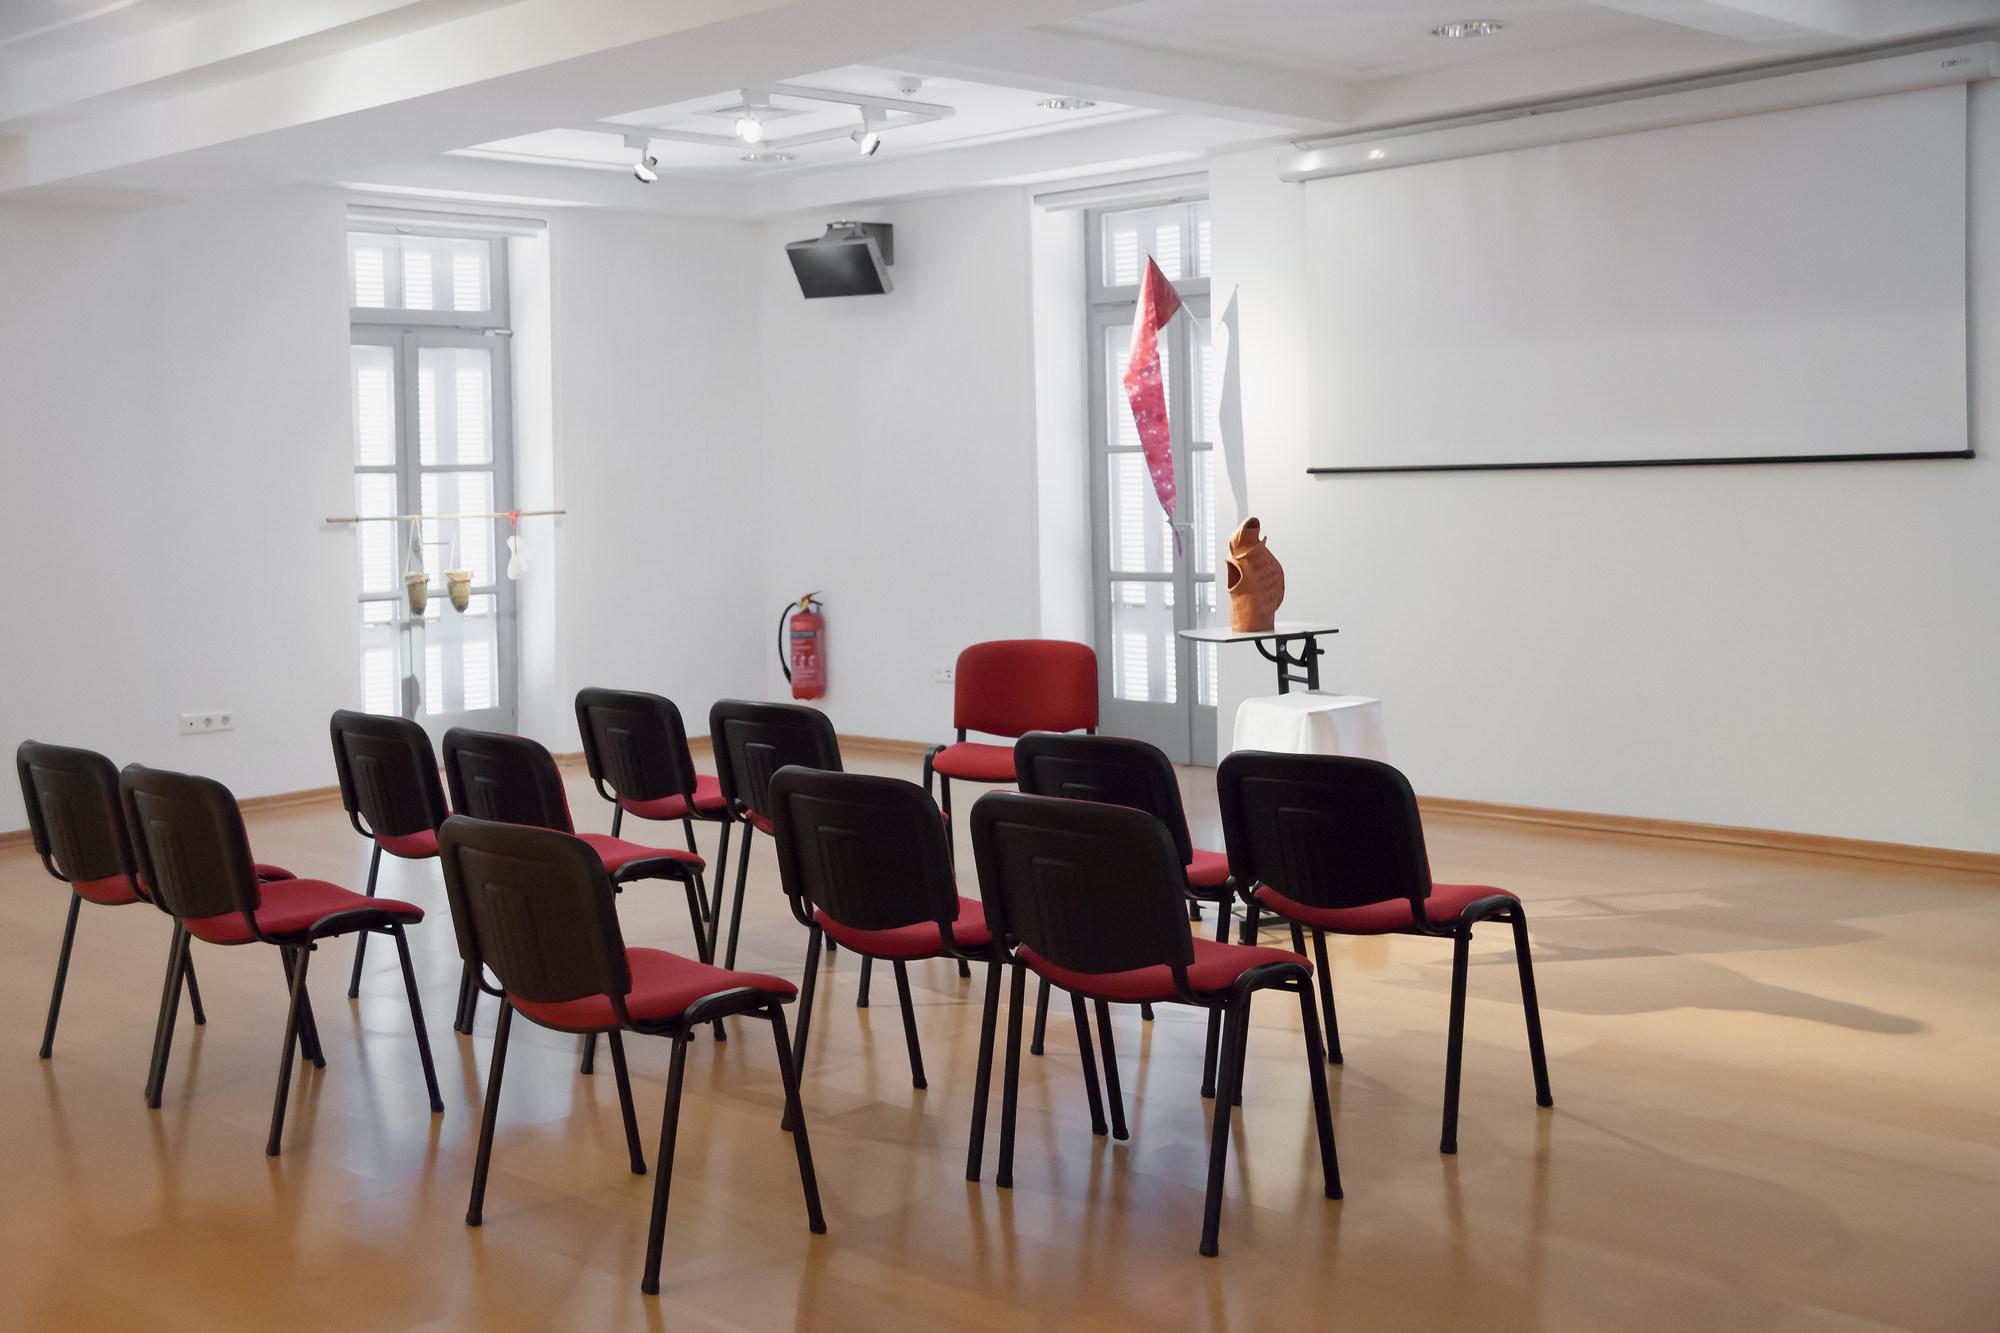 14. Exhibition view